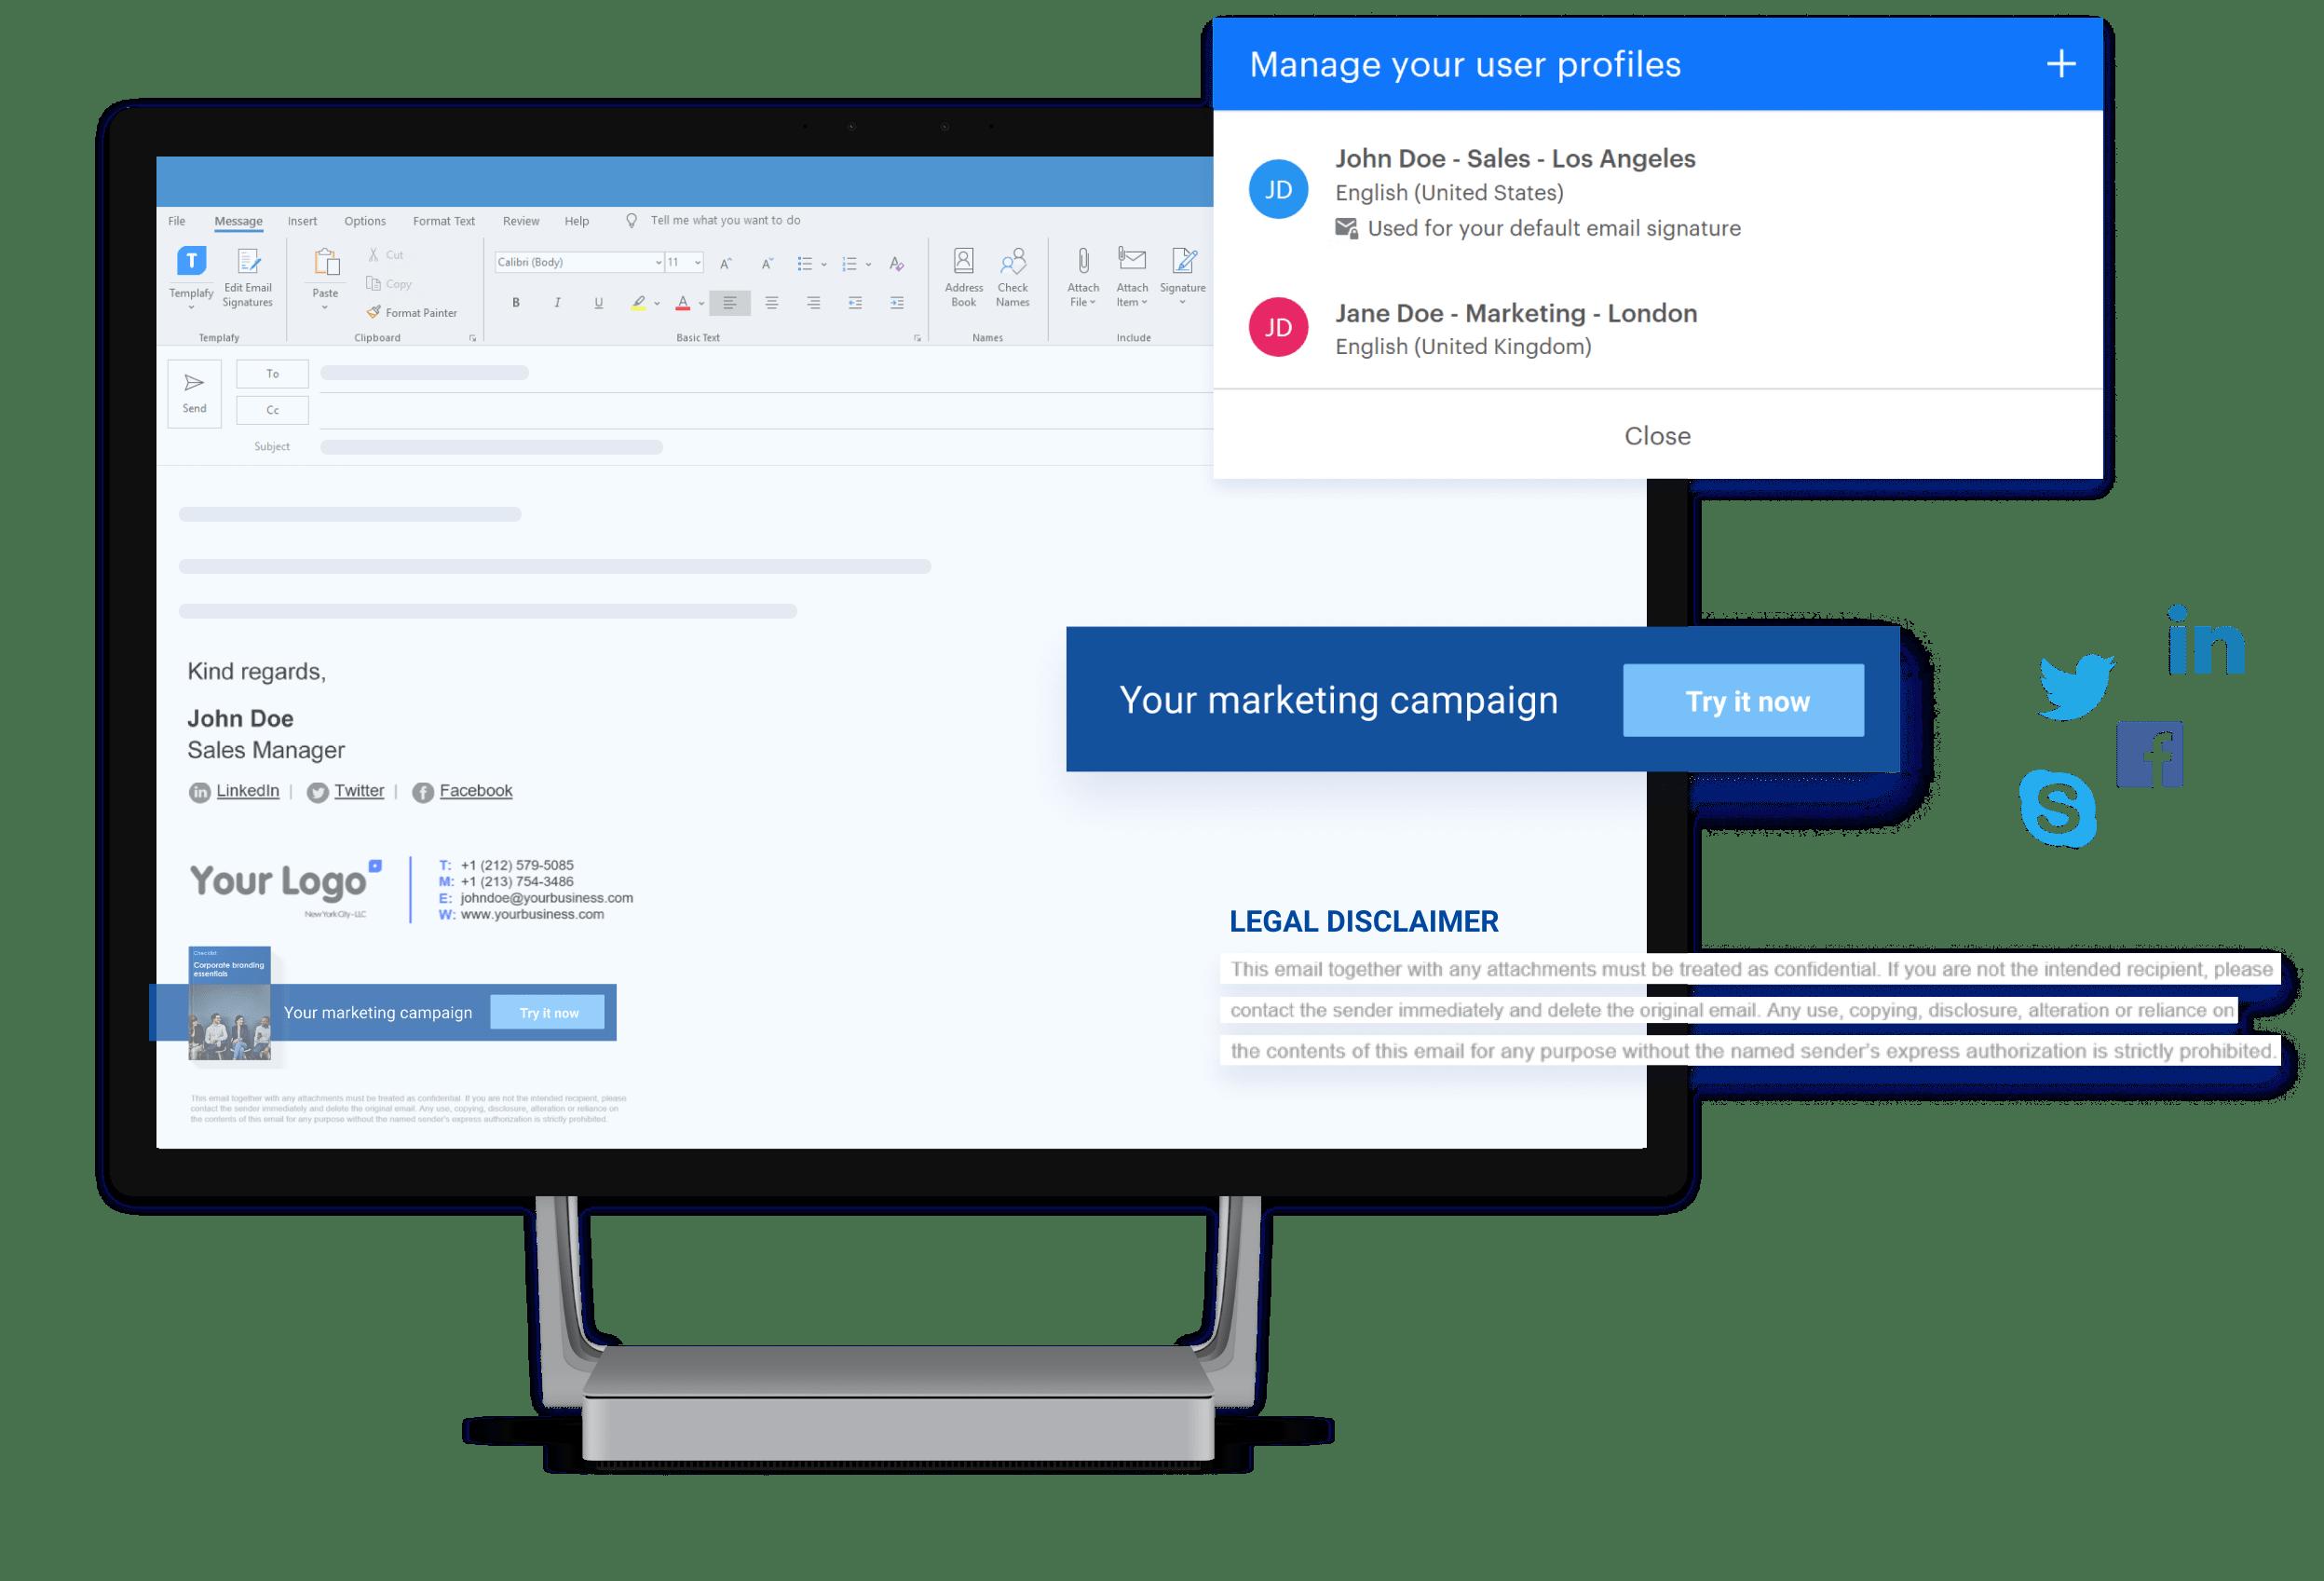 email-signature-management-software